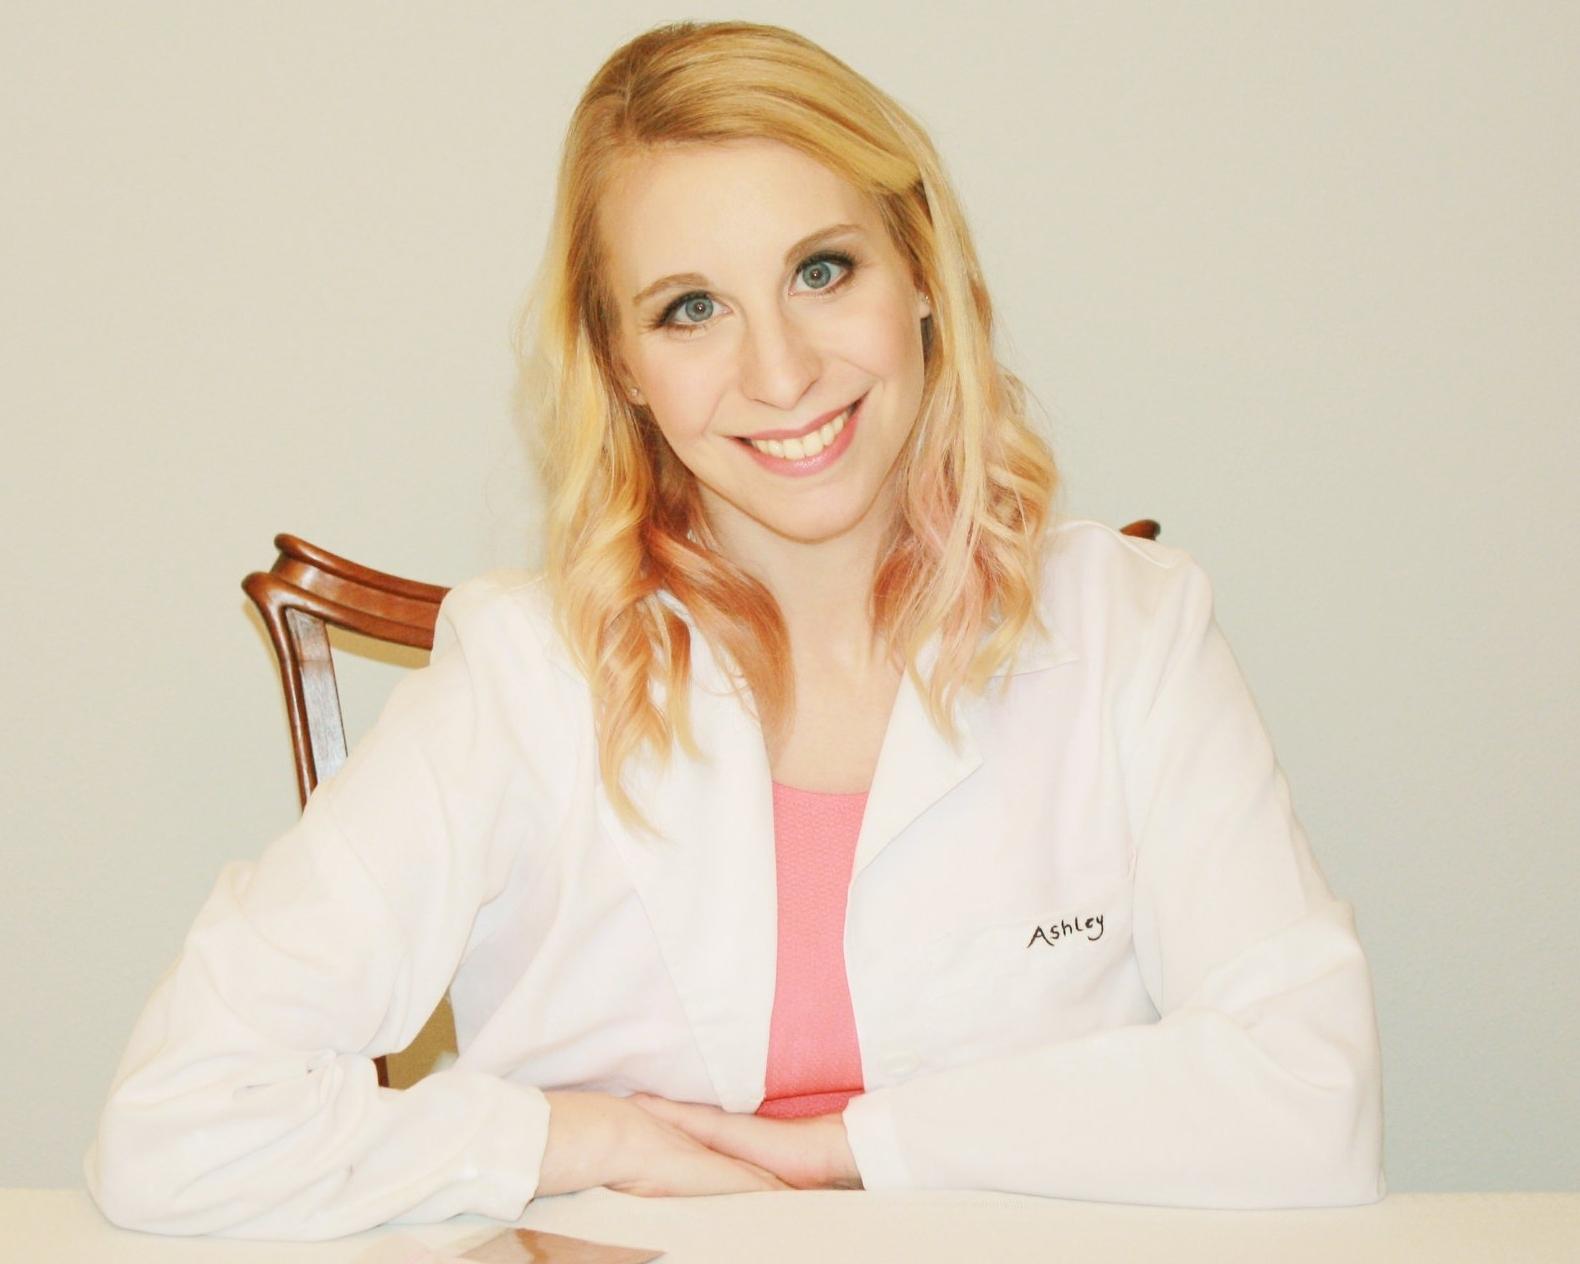 Ashley Pinch Cosmetic Chemist & Founder of Garnish Cosmetics